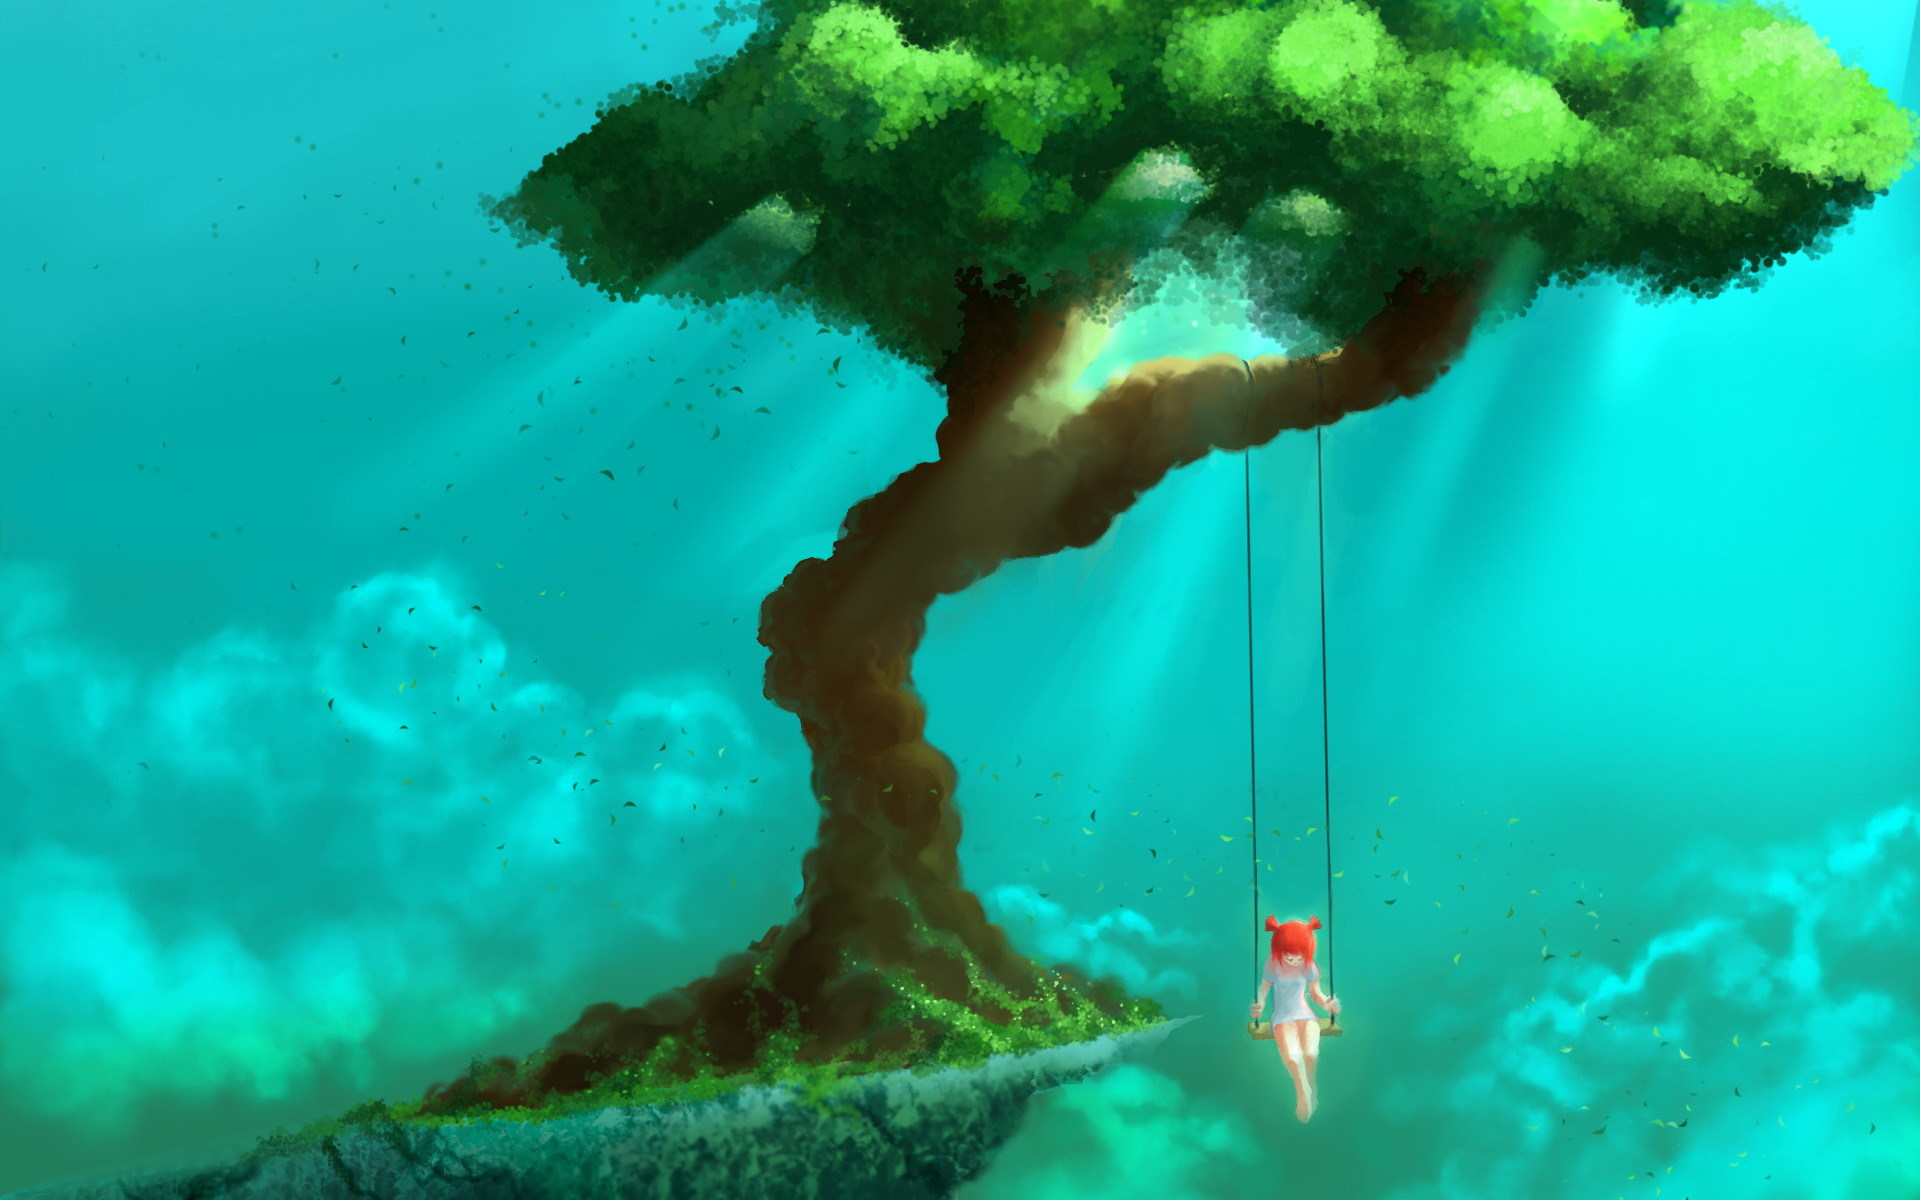 Fantasy dream mood emotion wonder swing situation art artistic